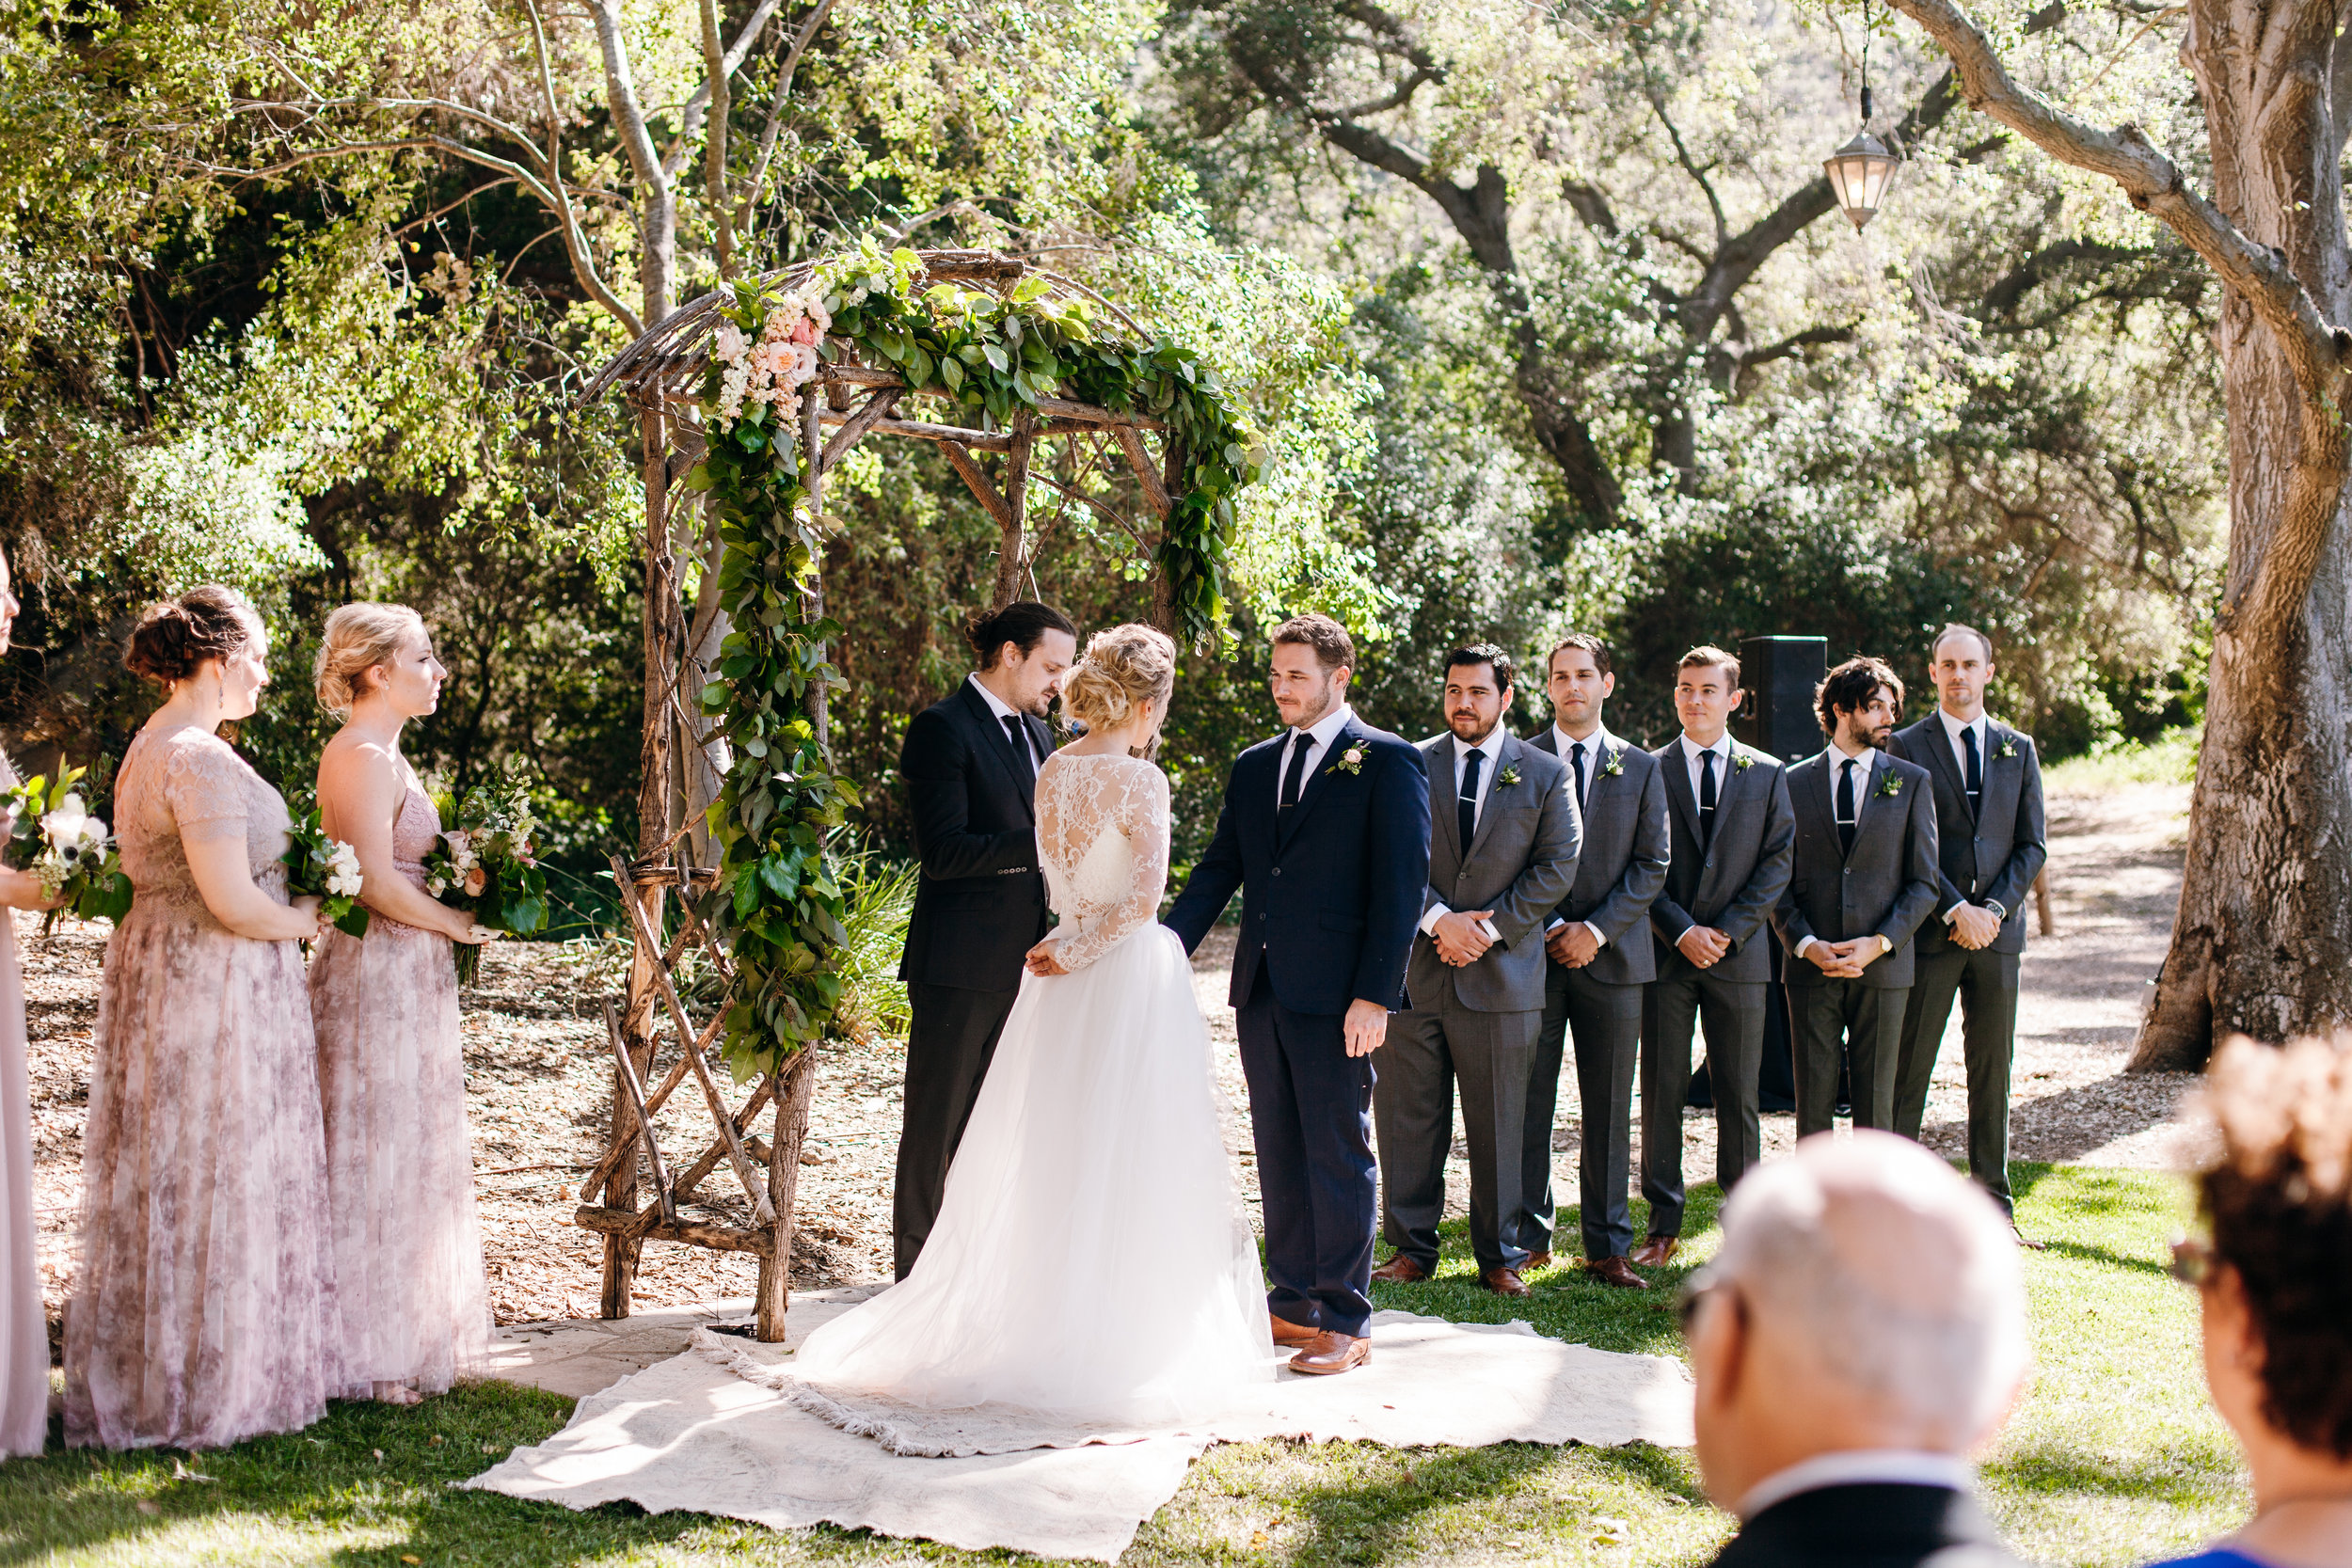 KaraNixonWeddings-TemeculaCreekInn-Wedding-15.jpg